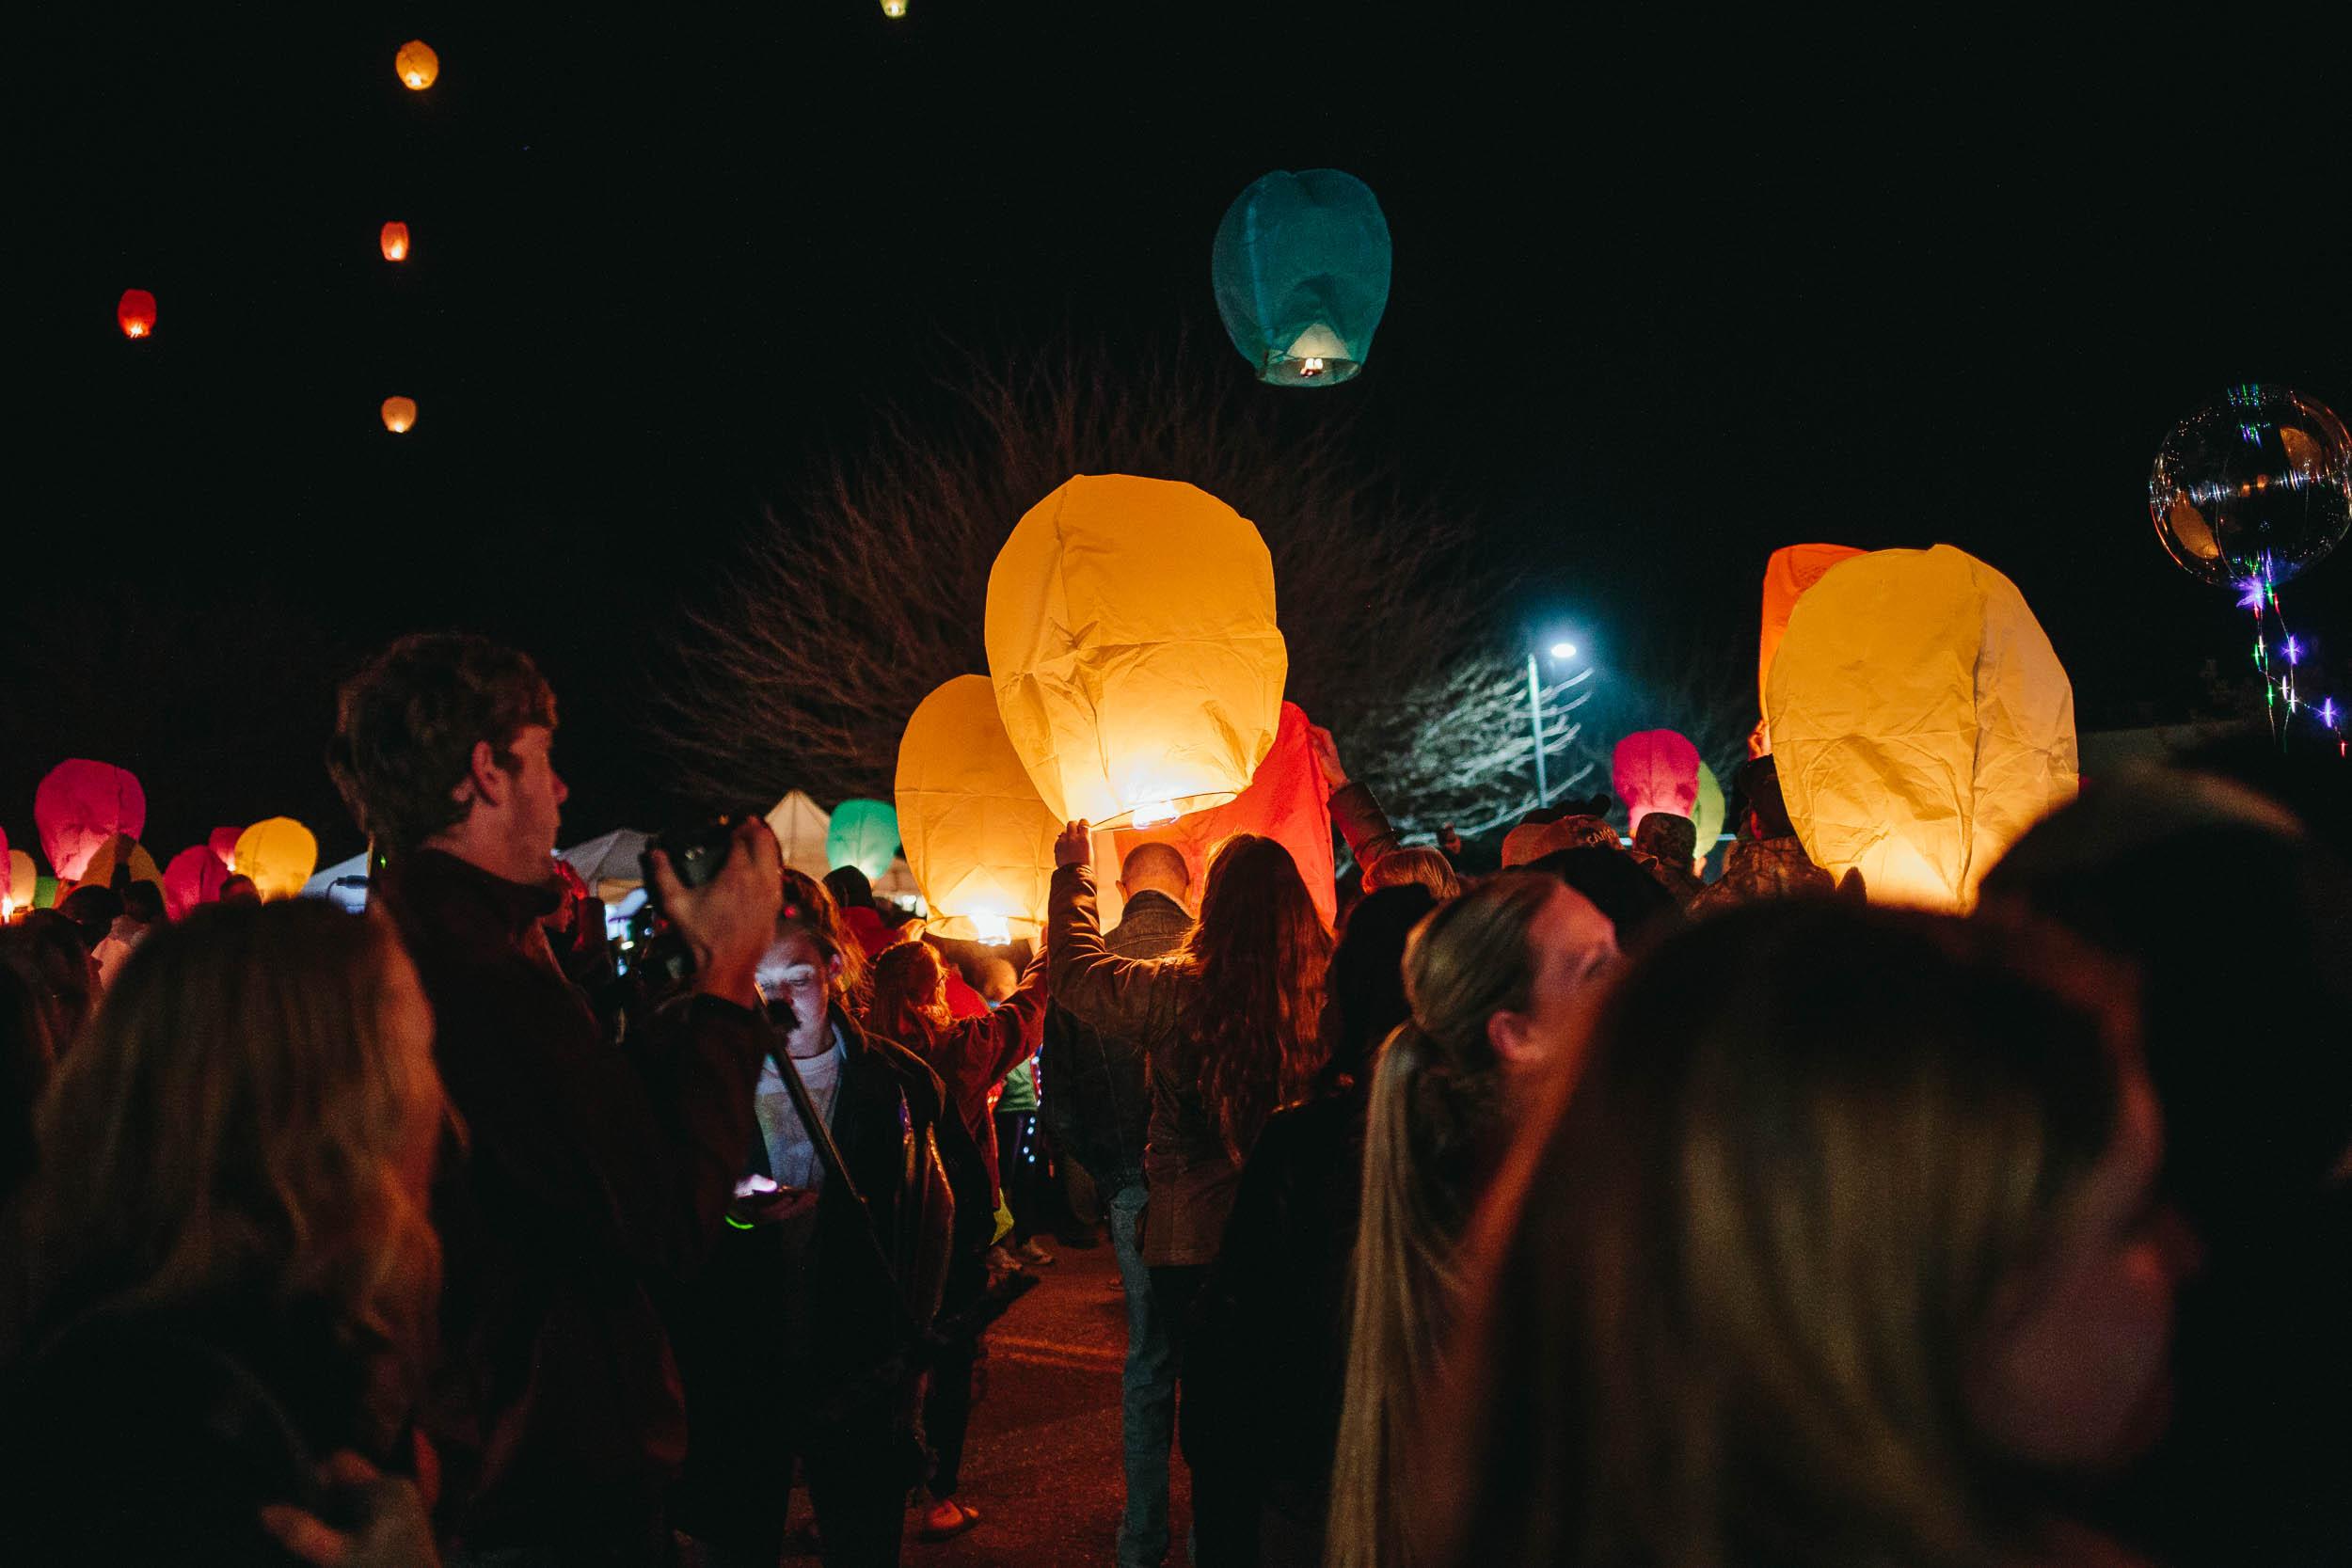 Kyle-Sheppard-Kanab-Balloon-Festival-58.jpg